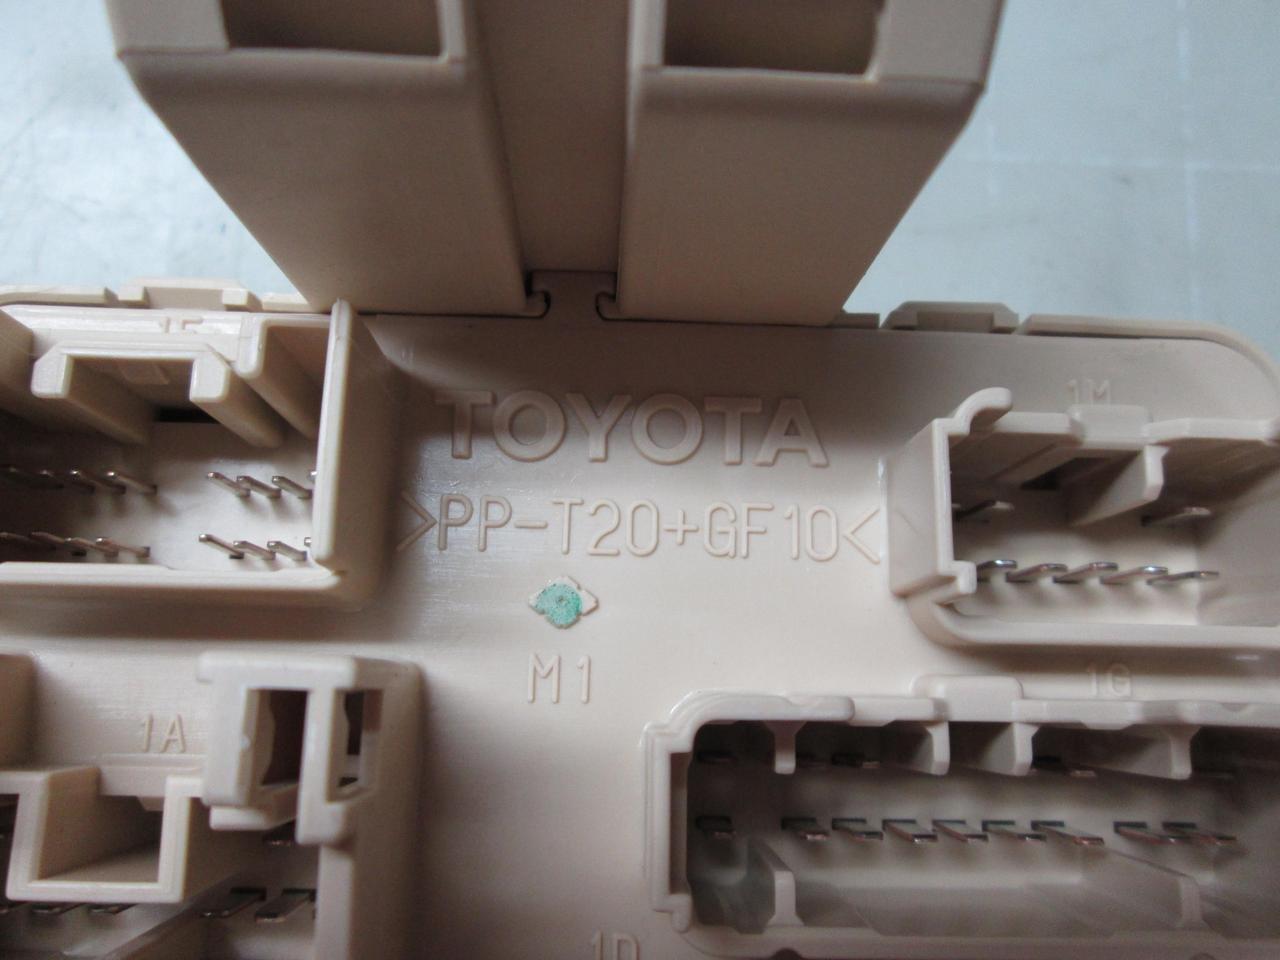 Toyota PP-T20+GF10 Fuse Box T53497